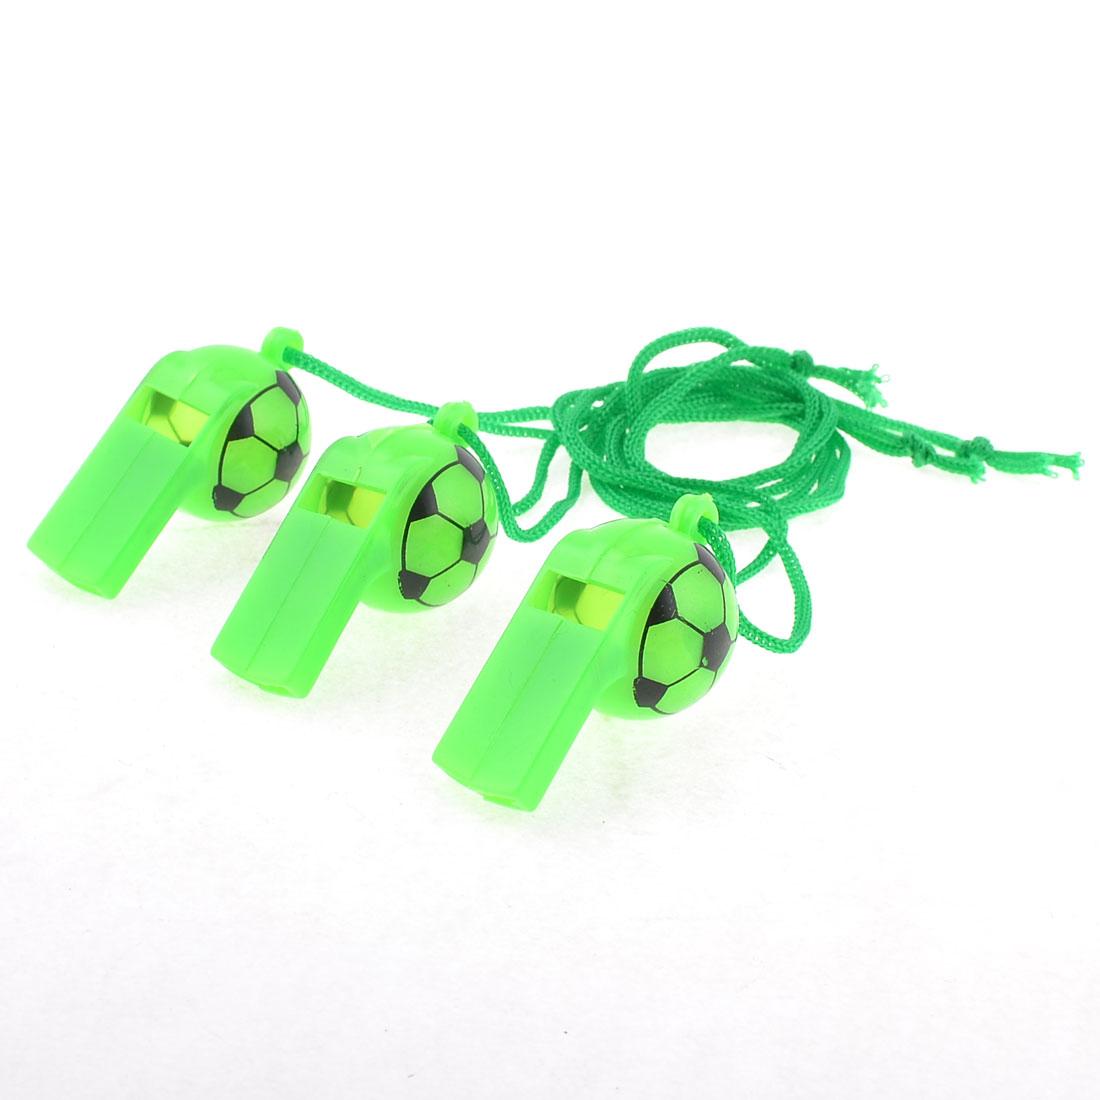 Neck String Football Pattern Plastic Referee Type Whistles Green 3 Pcs